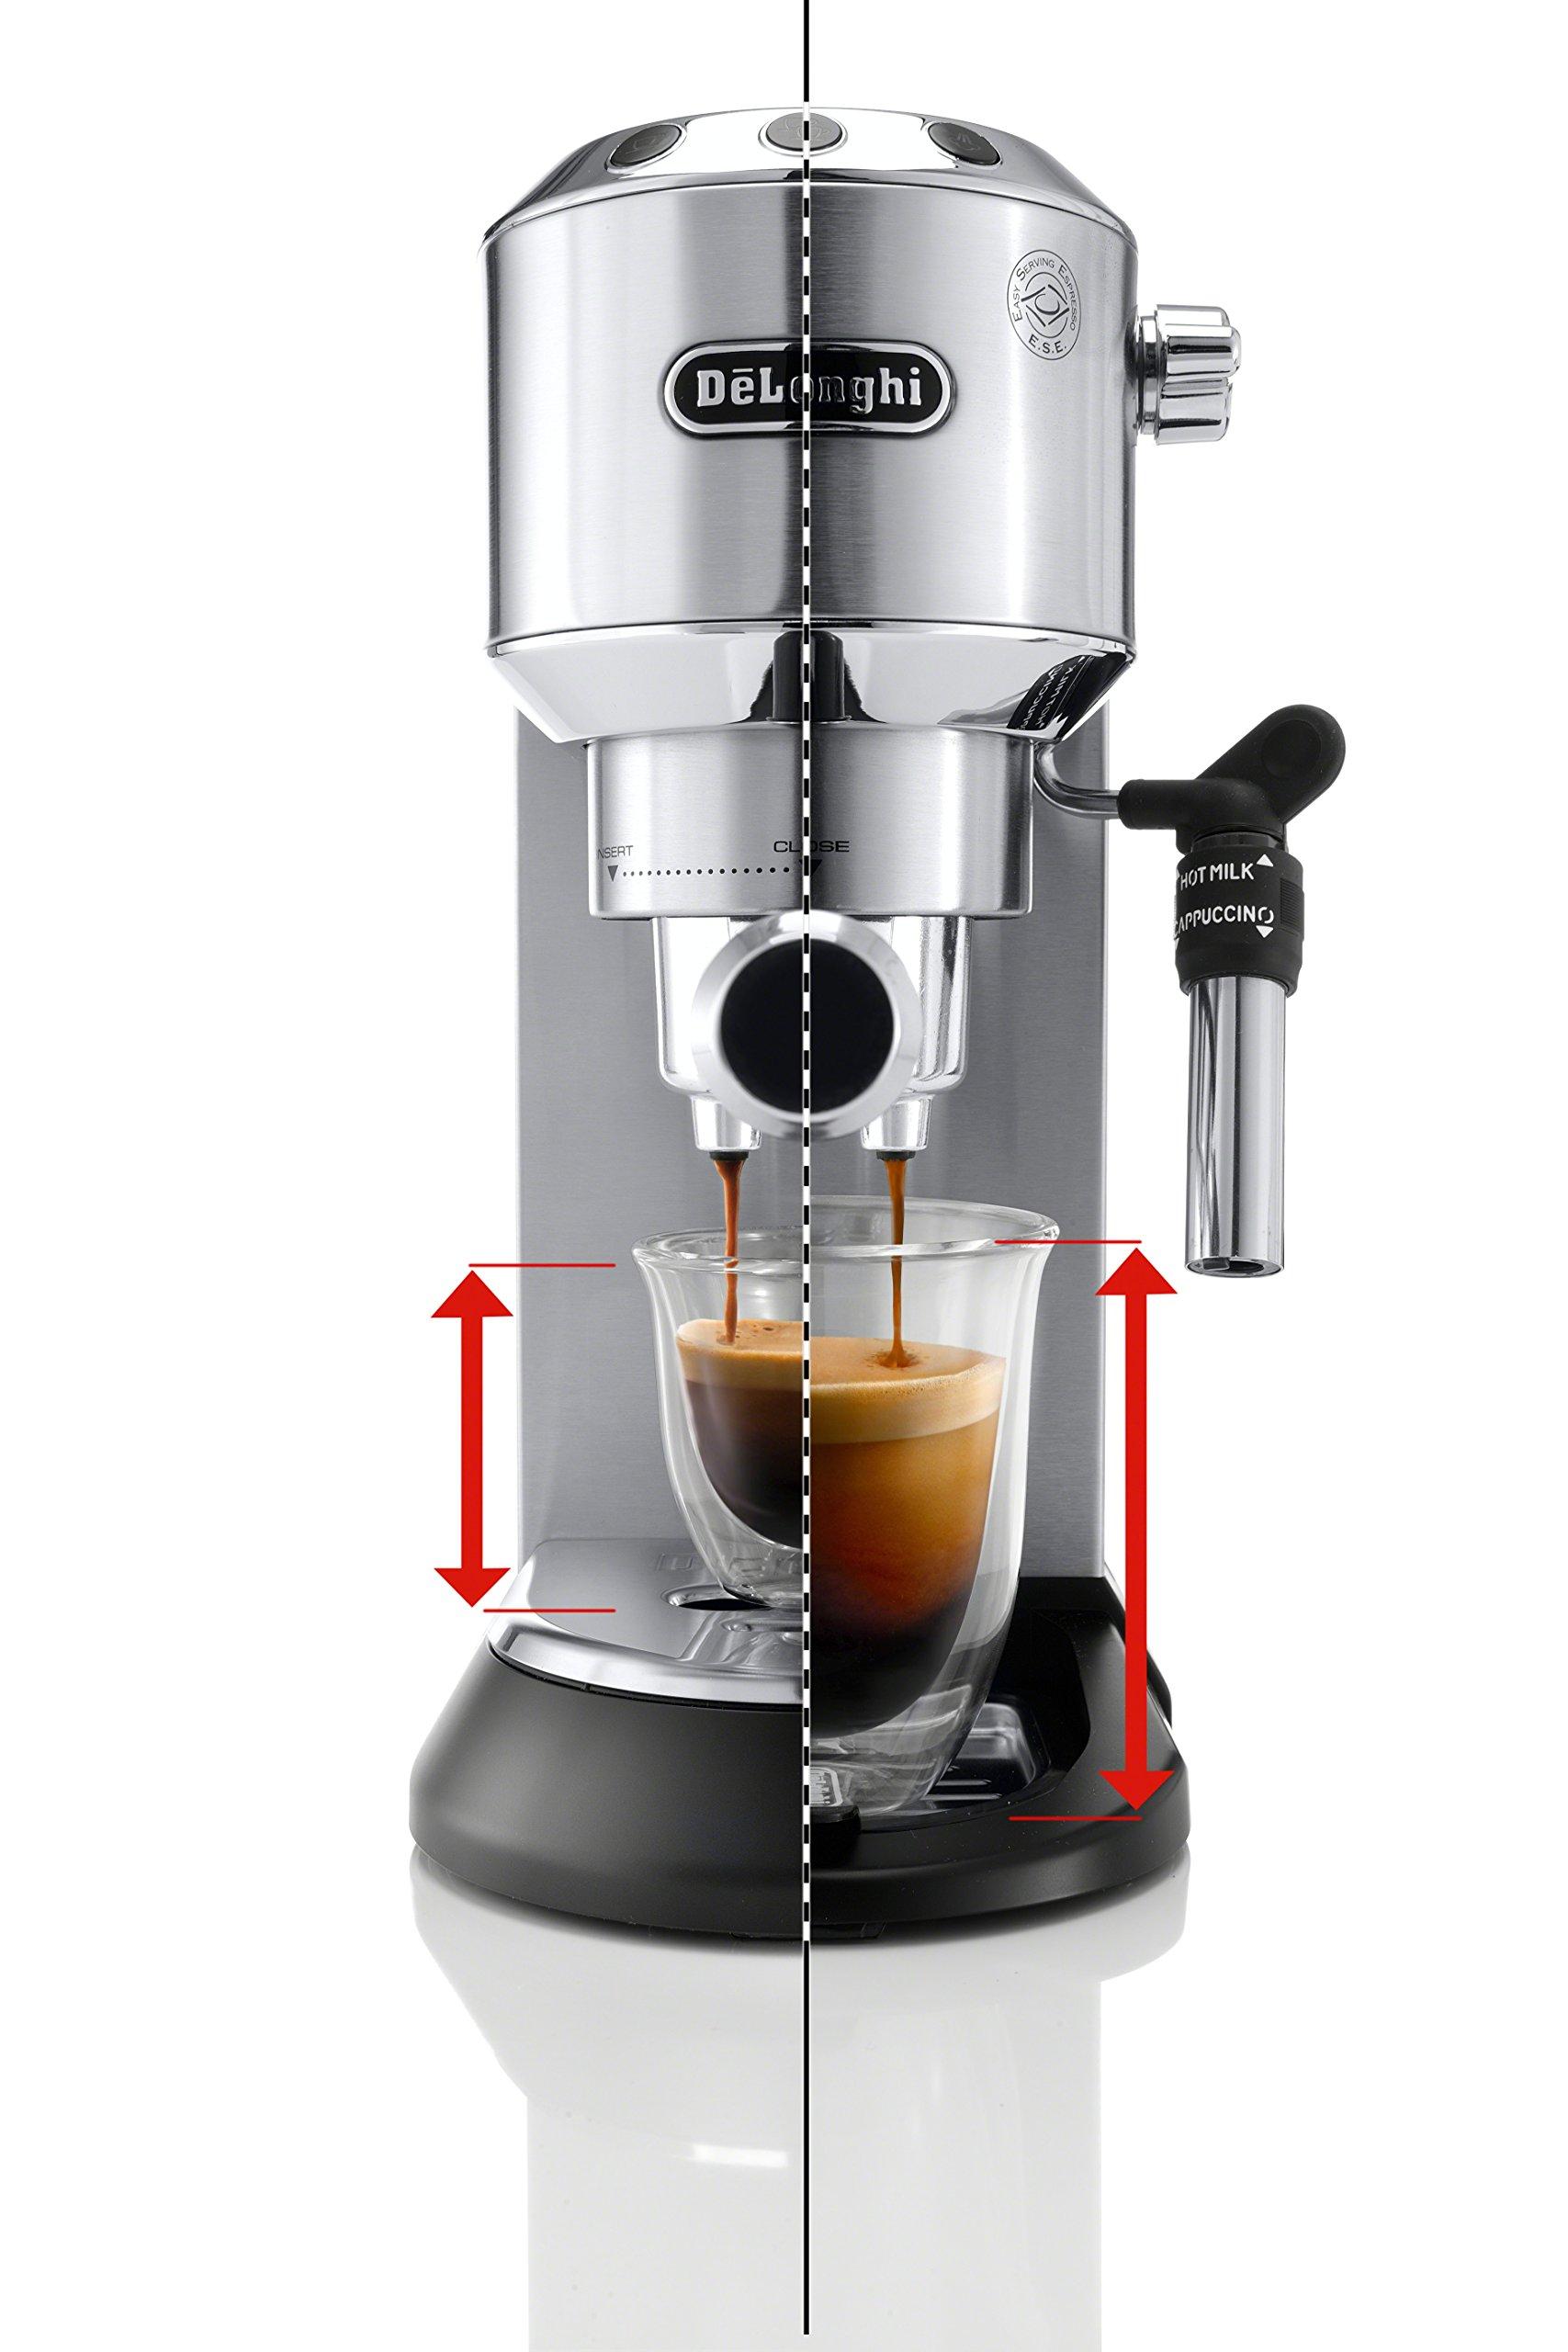 DeLonghi America, Inc EC685M Dedica Deluxe espresso, Silver by DeLonghi America, Inc (Image #6)